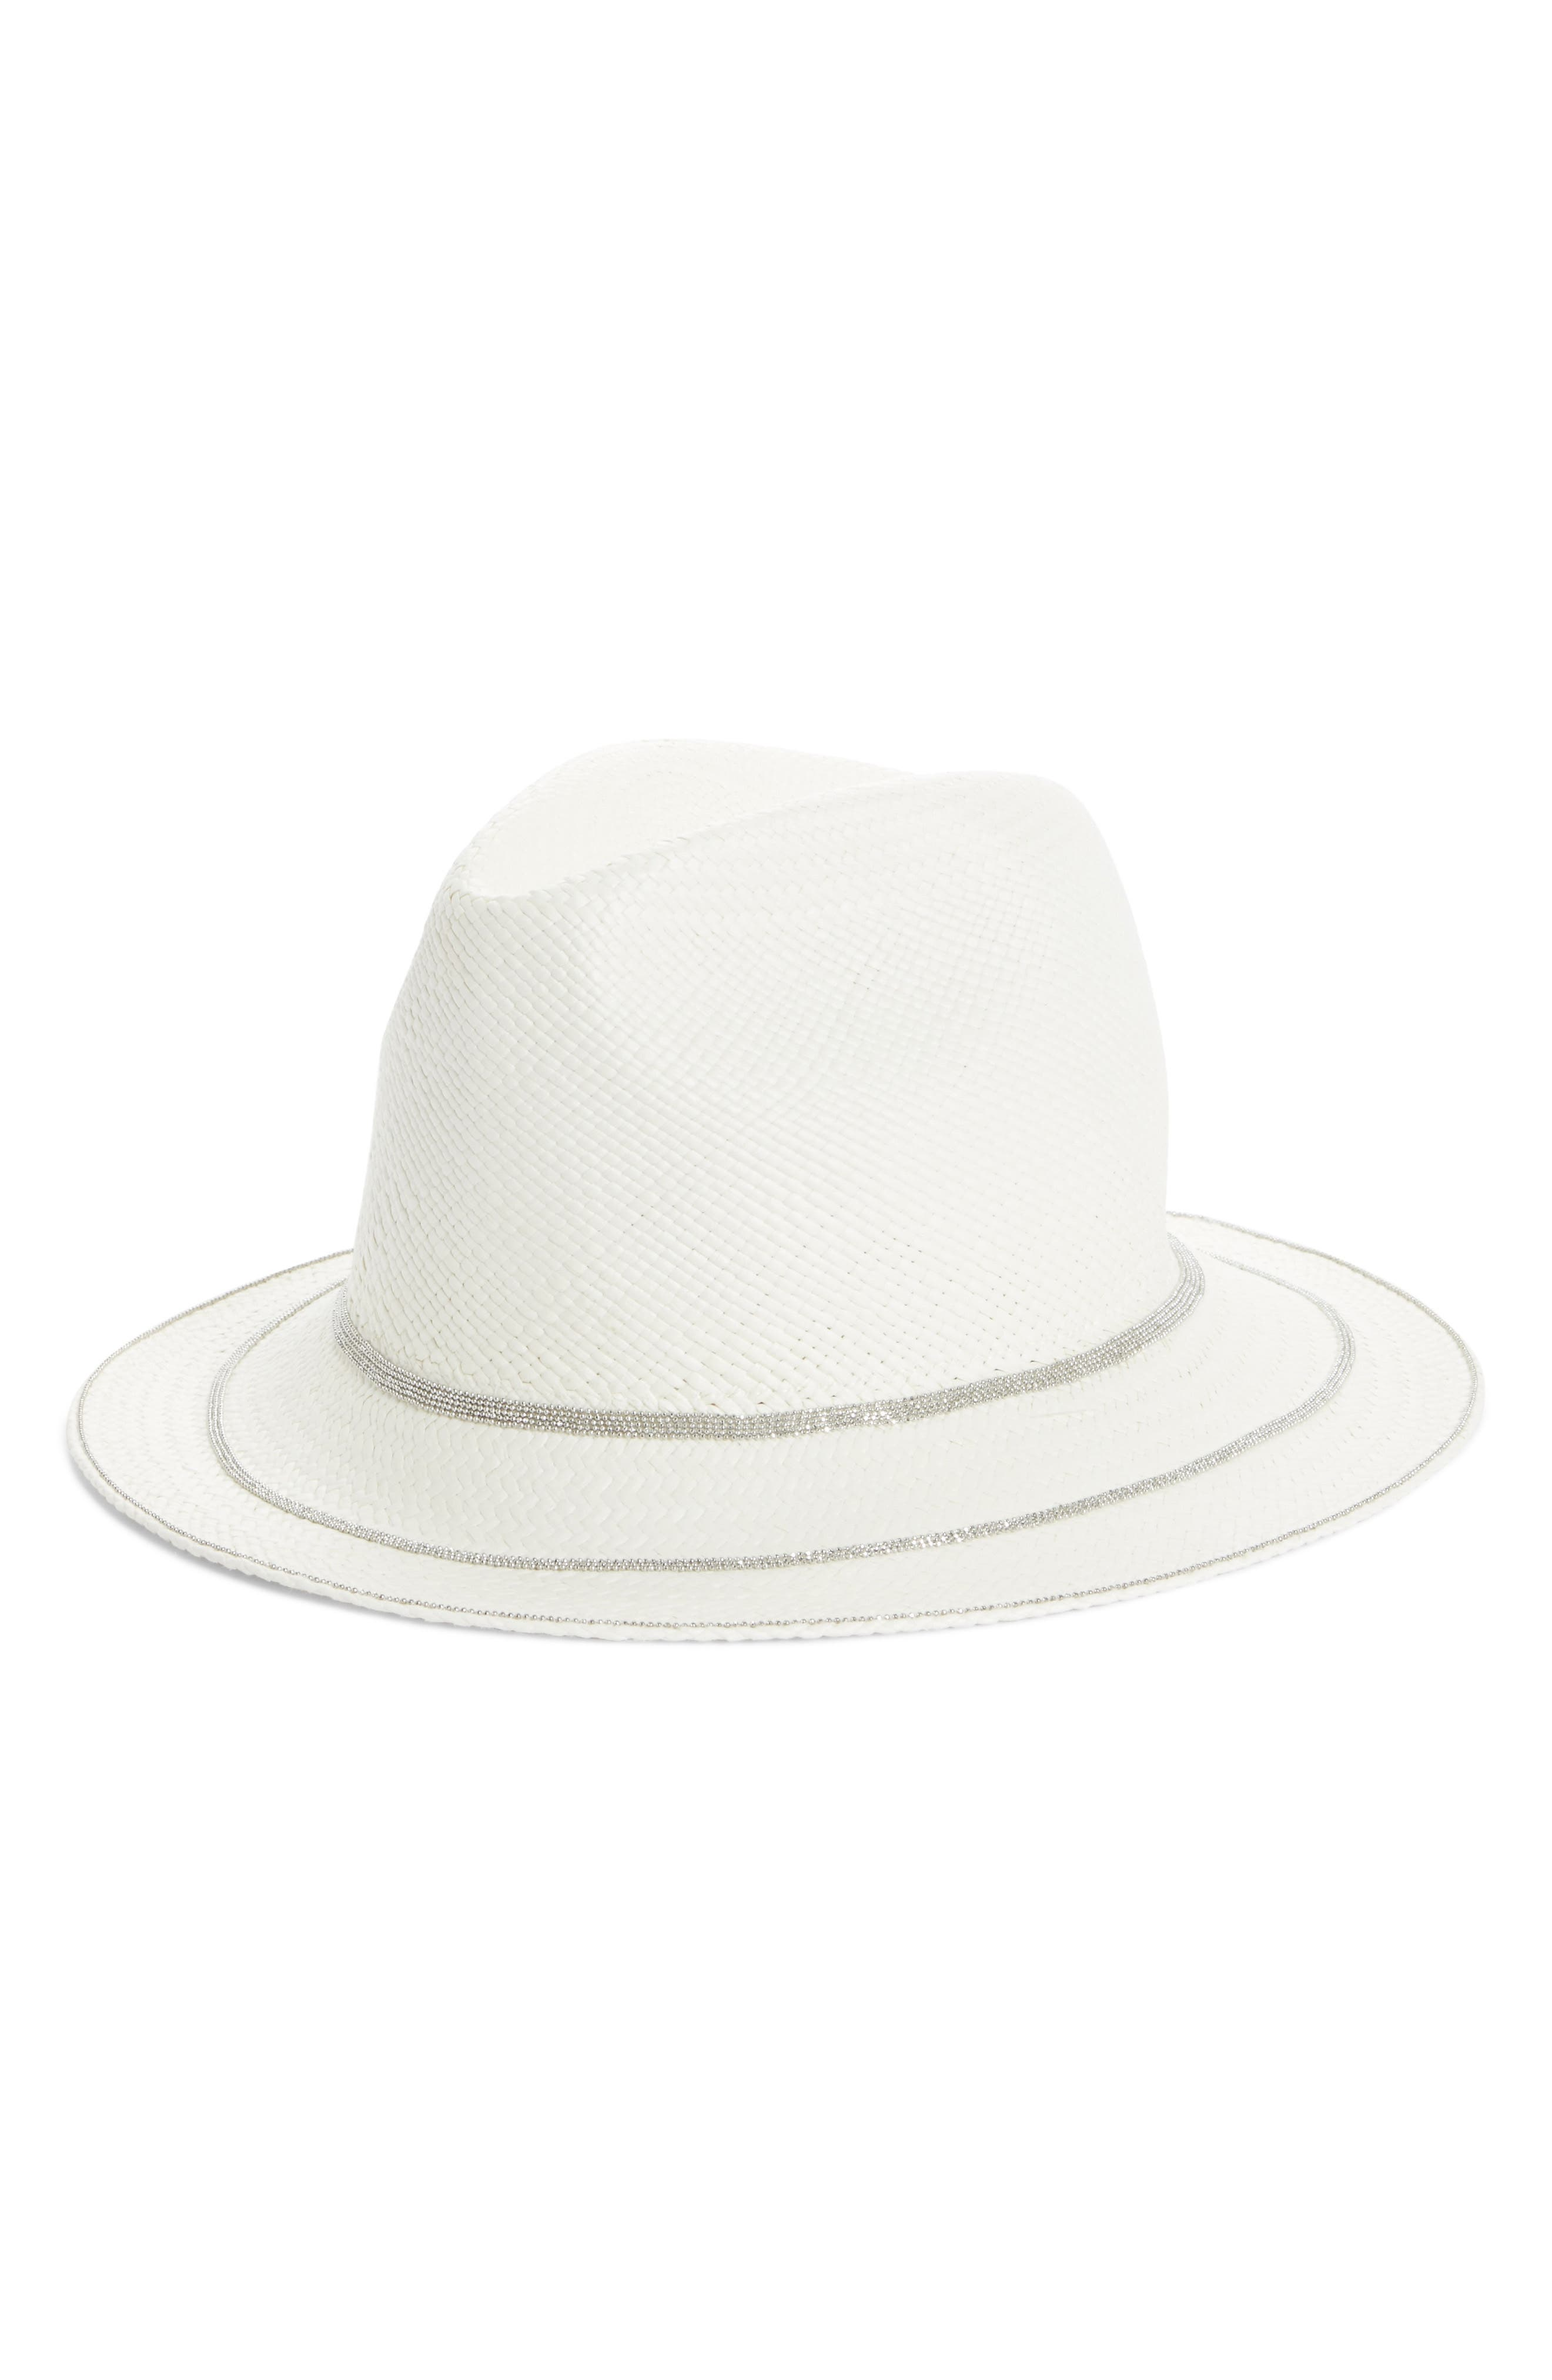 Fabiana Filippi Triple Layer Bead Straw Hat